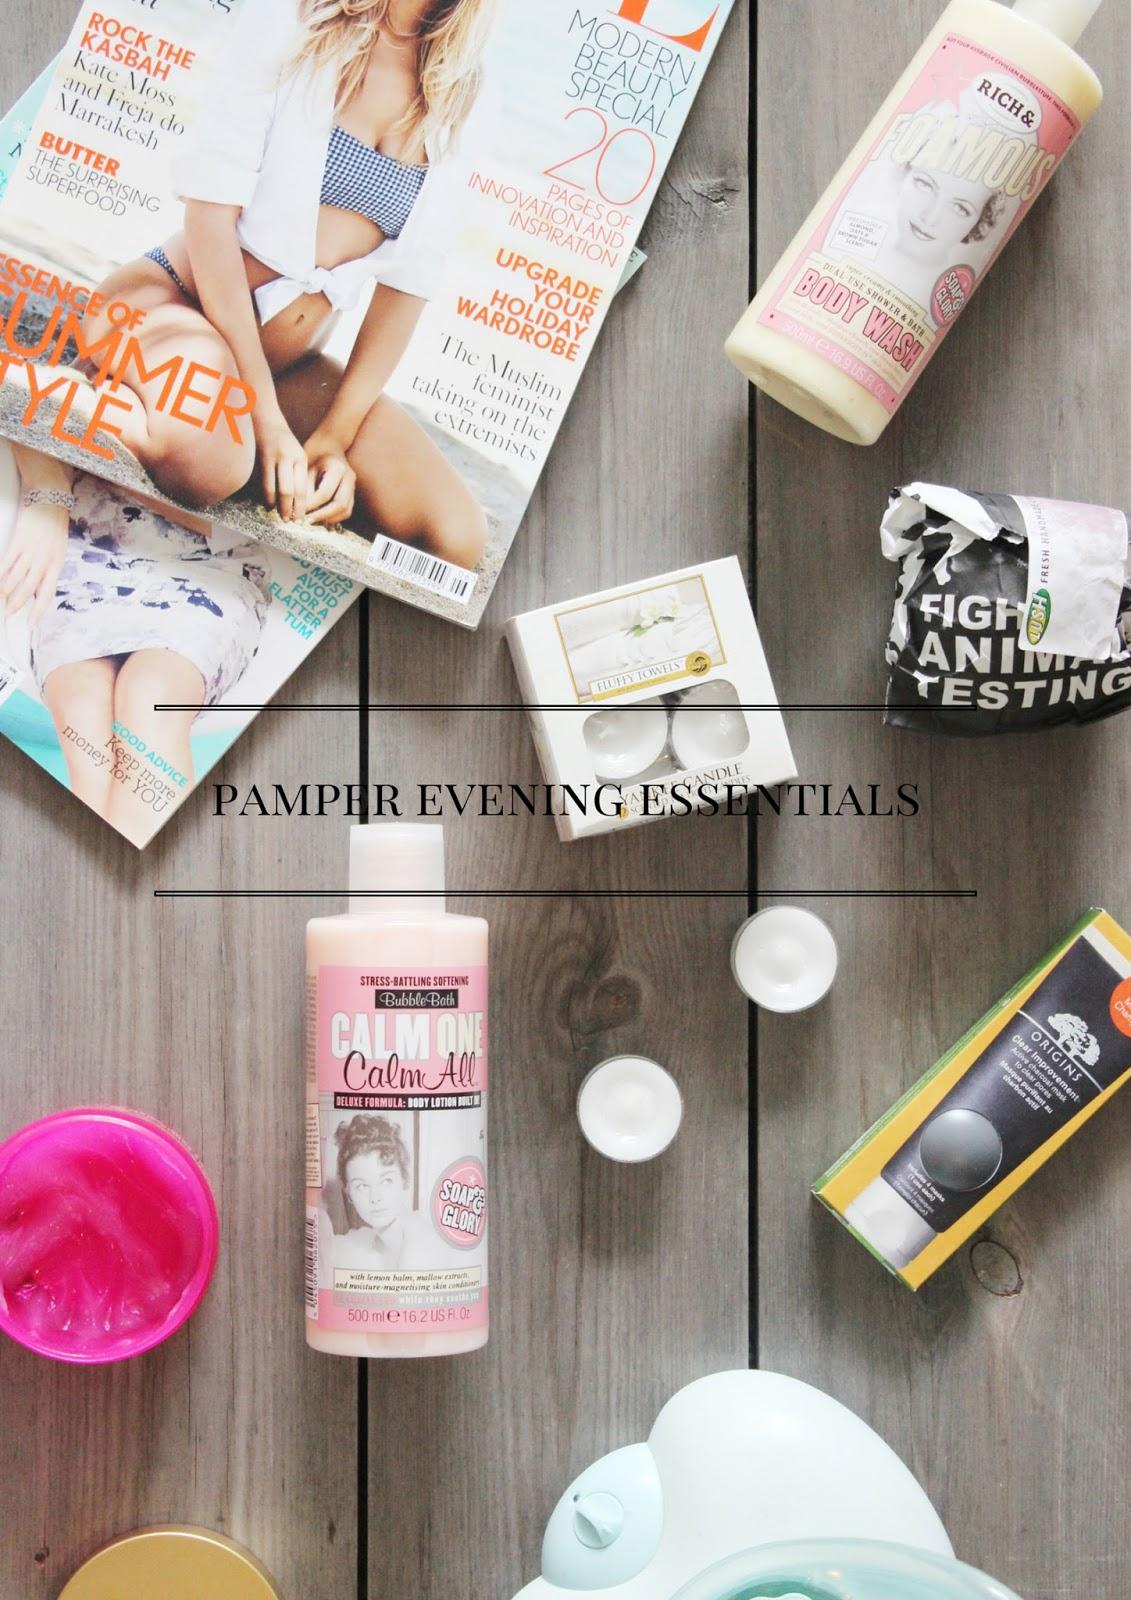 Pamper Evening Essentials With Victoria Plumb